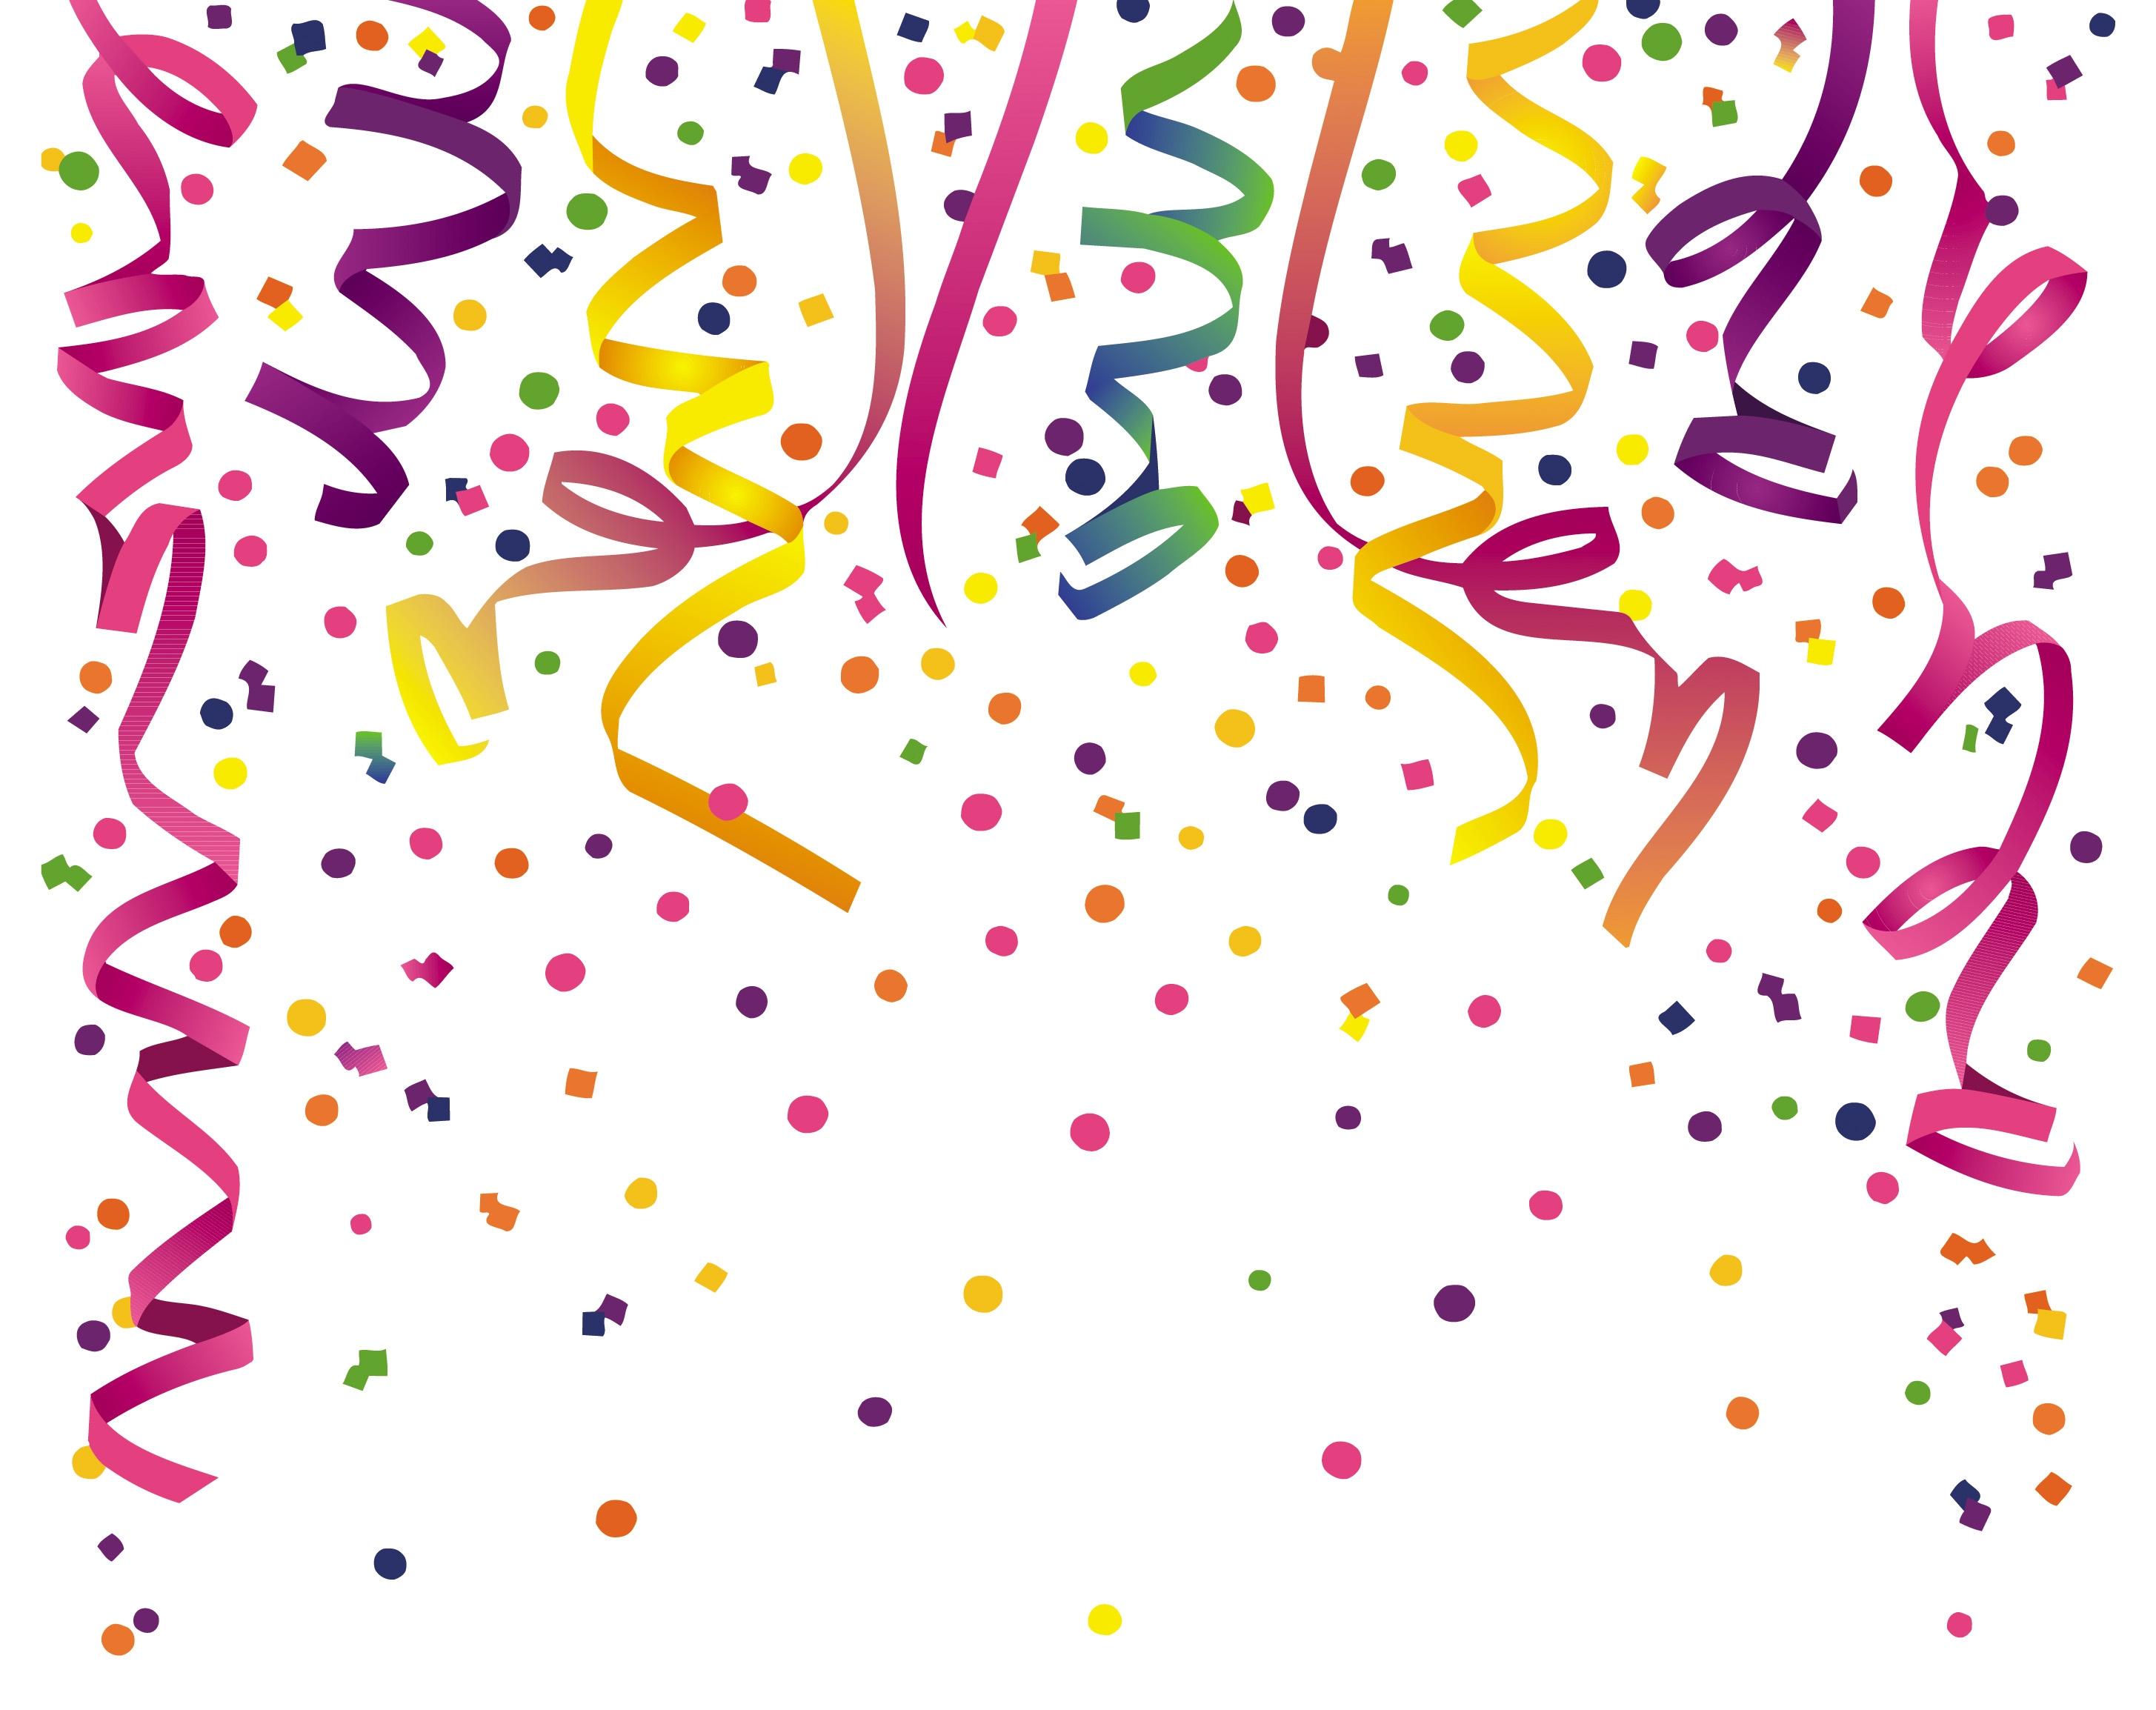 confetti clipart - 1 - o - Best Confetti Clipart Clipartion